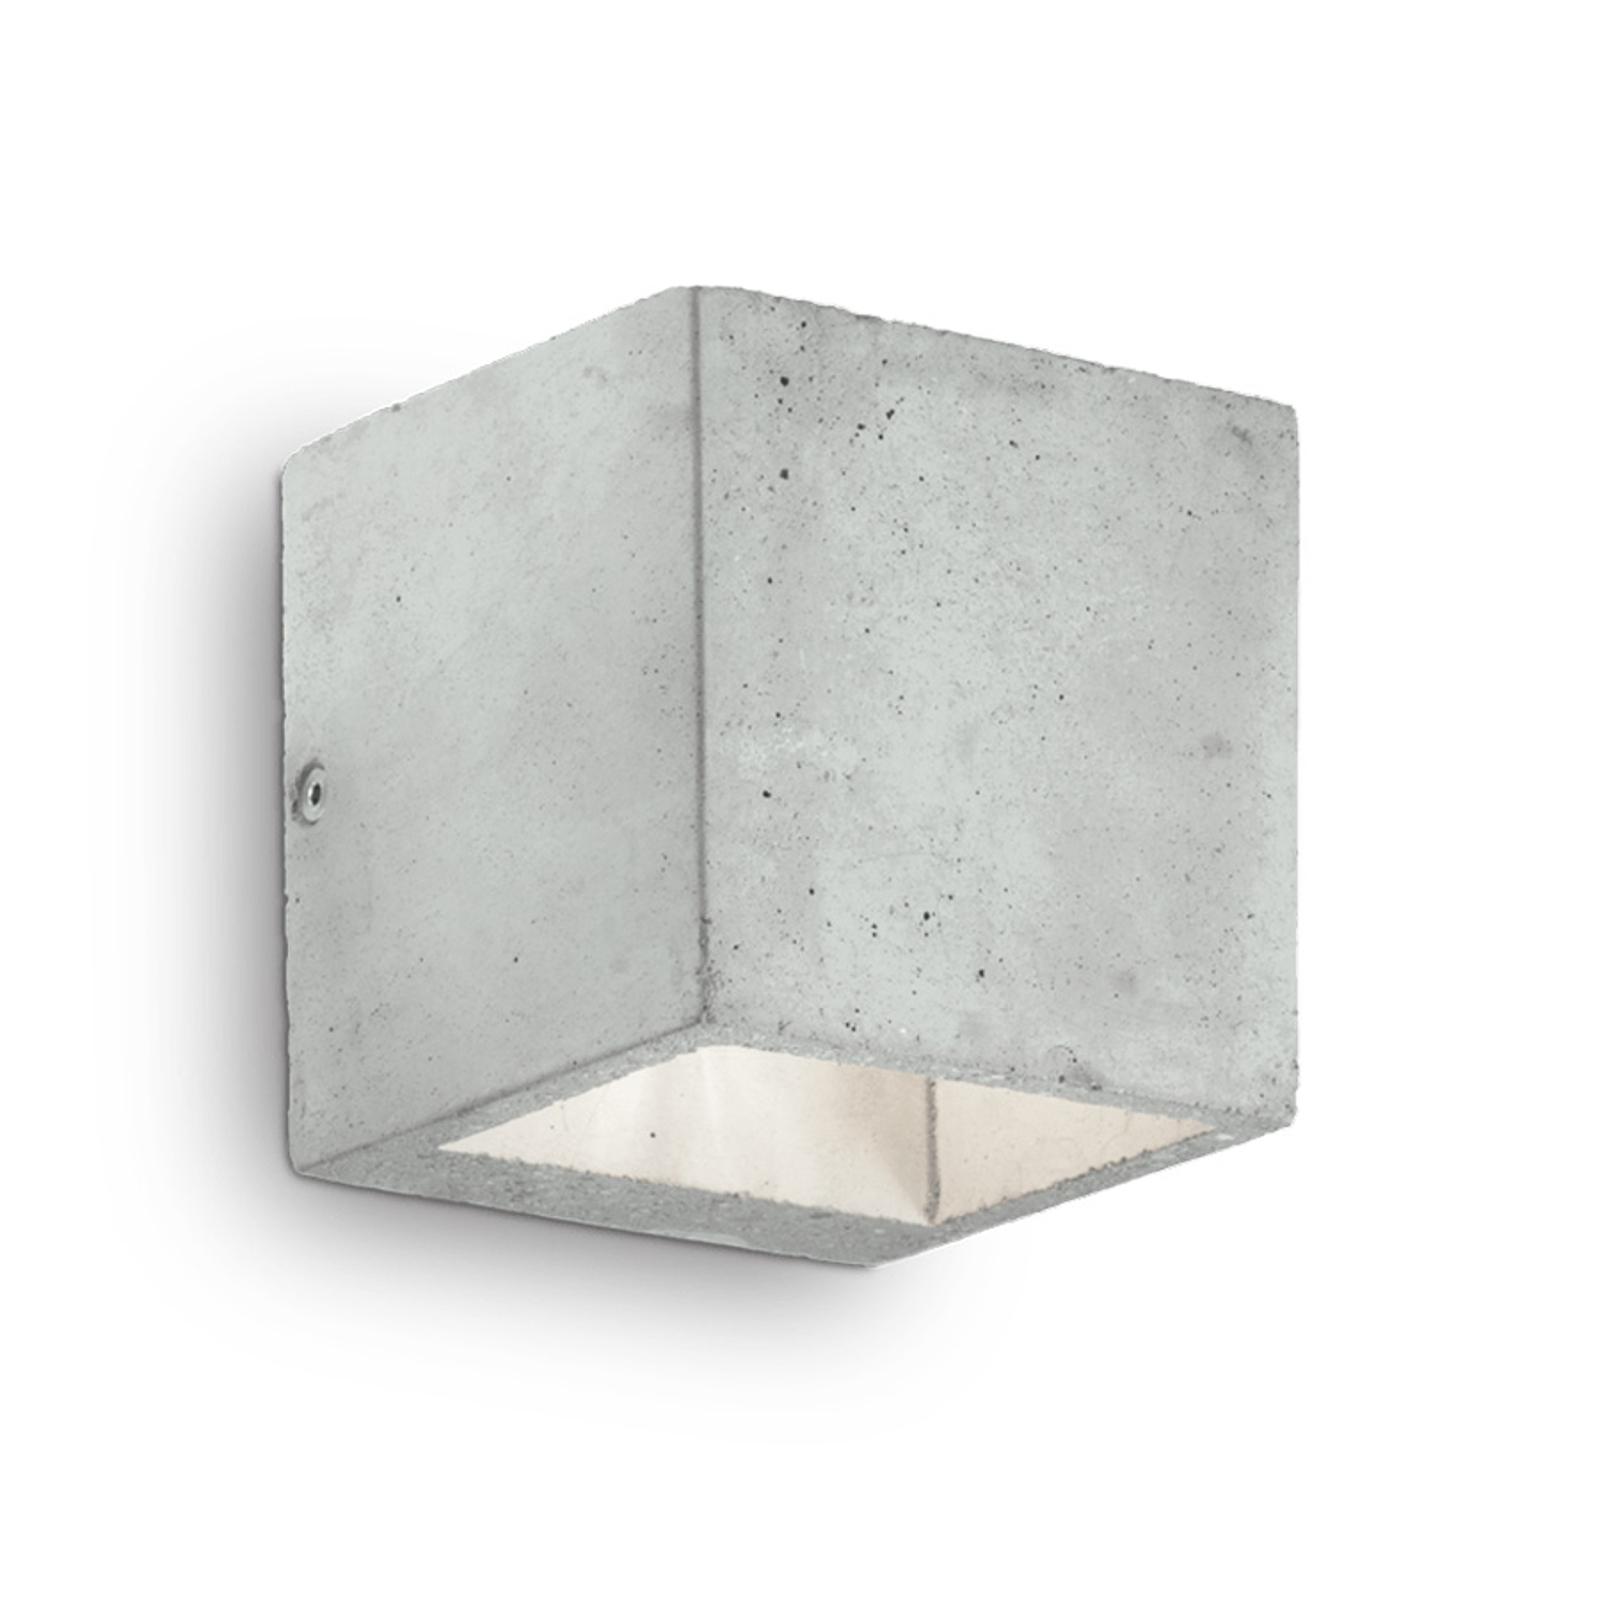 Wandleuchte Kool aus Zement, Höhe 10 cm